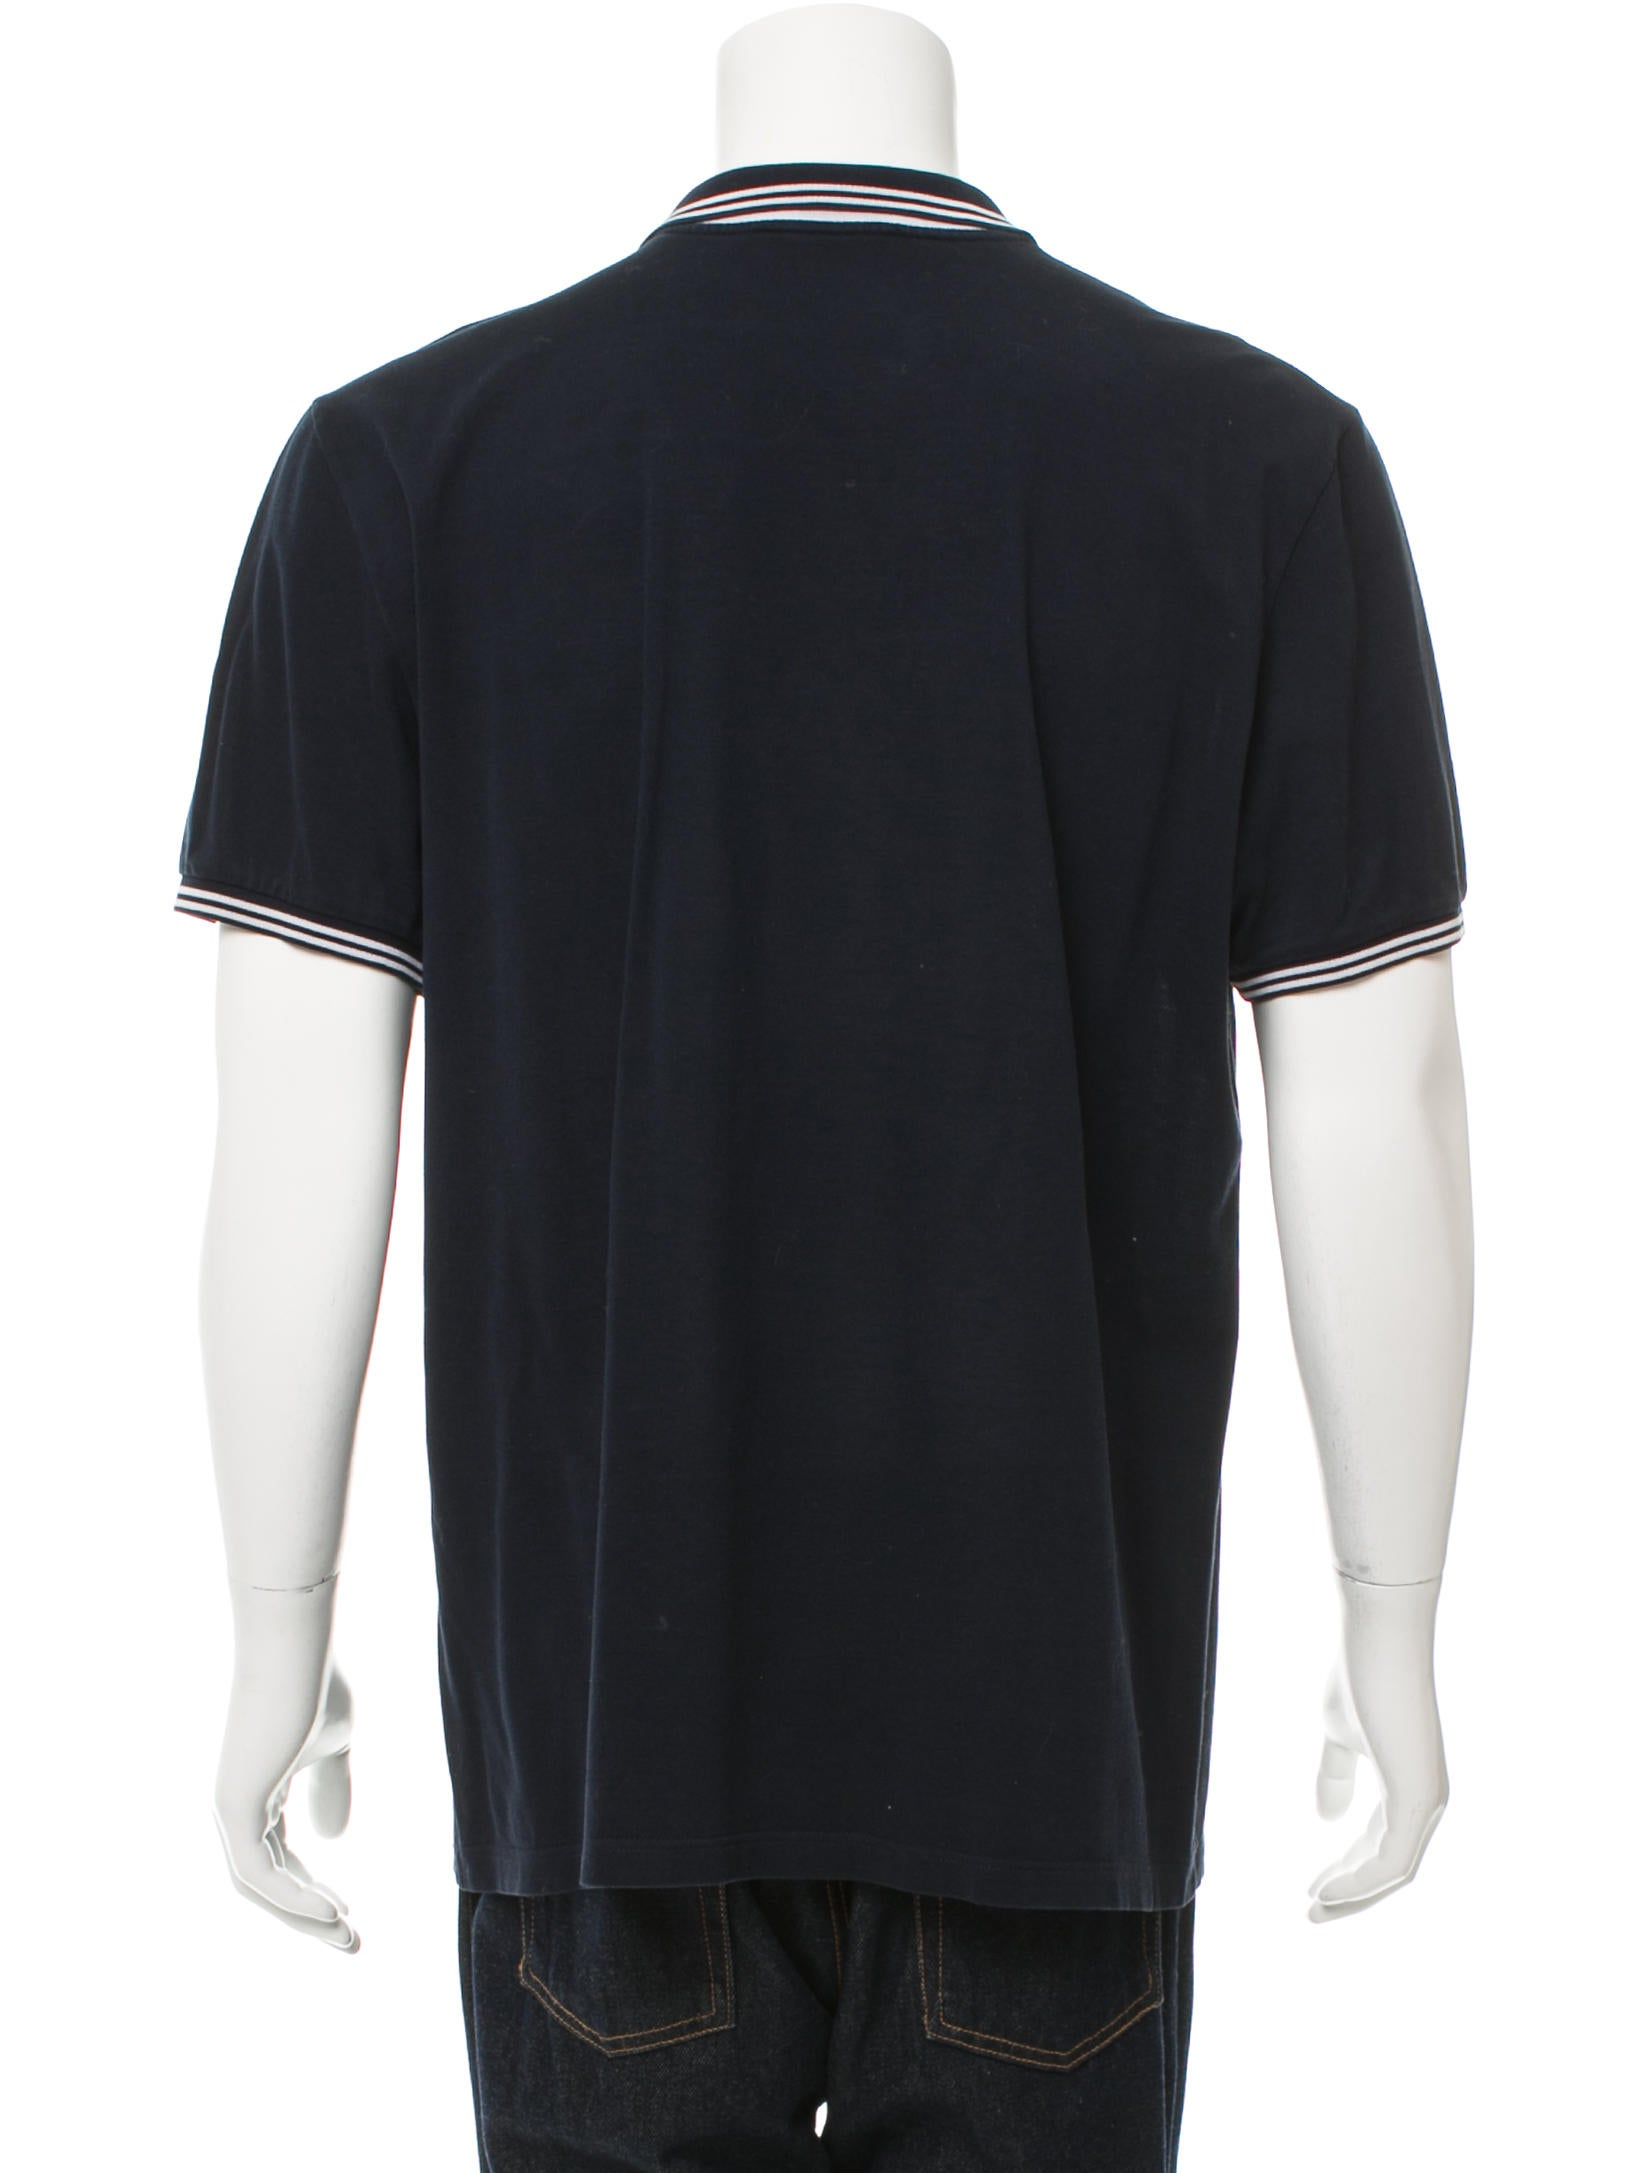 Salvatore Ferragamo Gancini Polo Shirt - Clothing ...